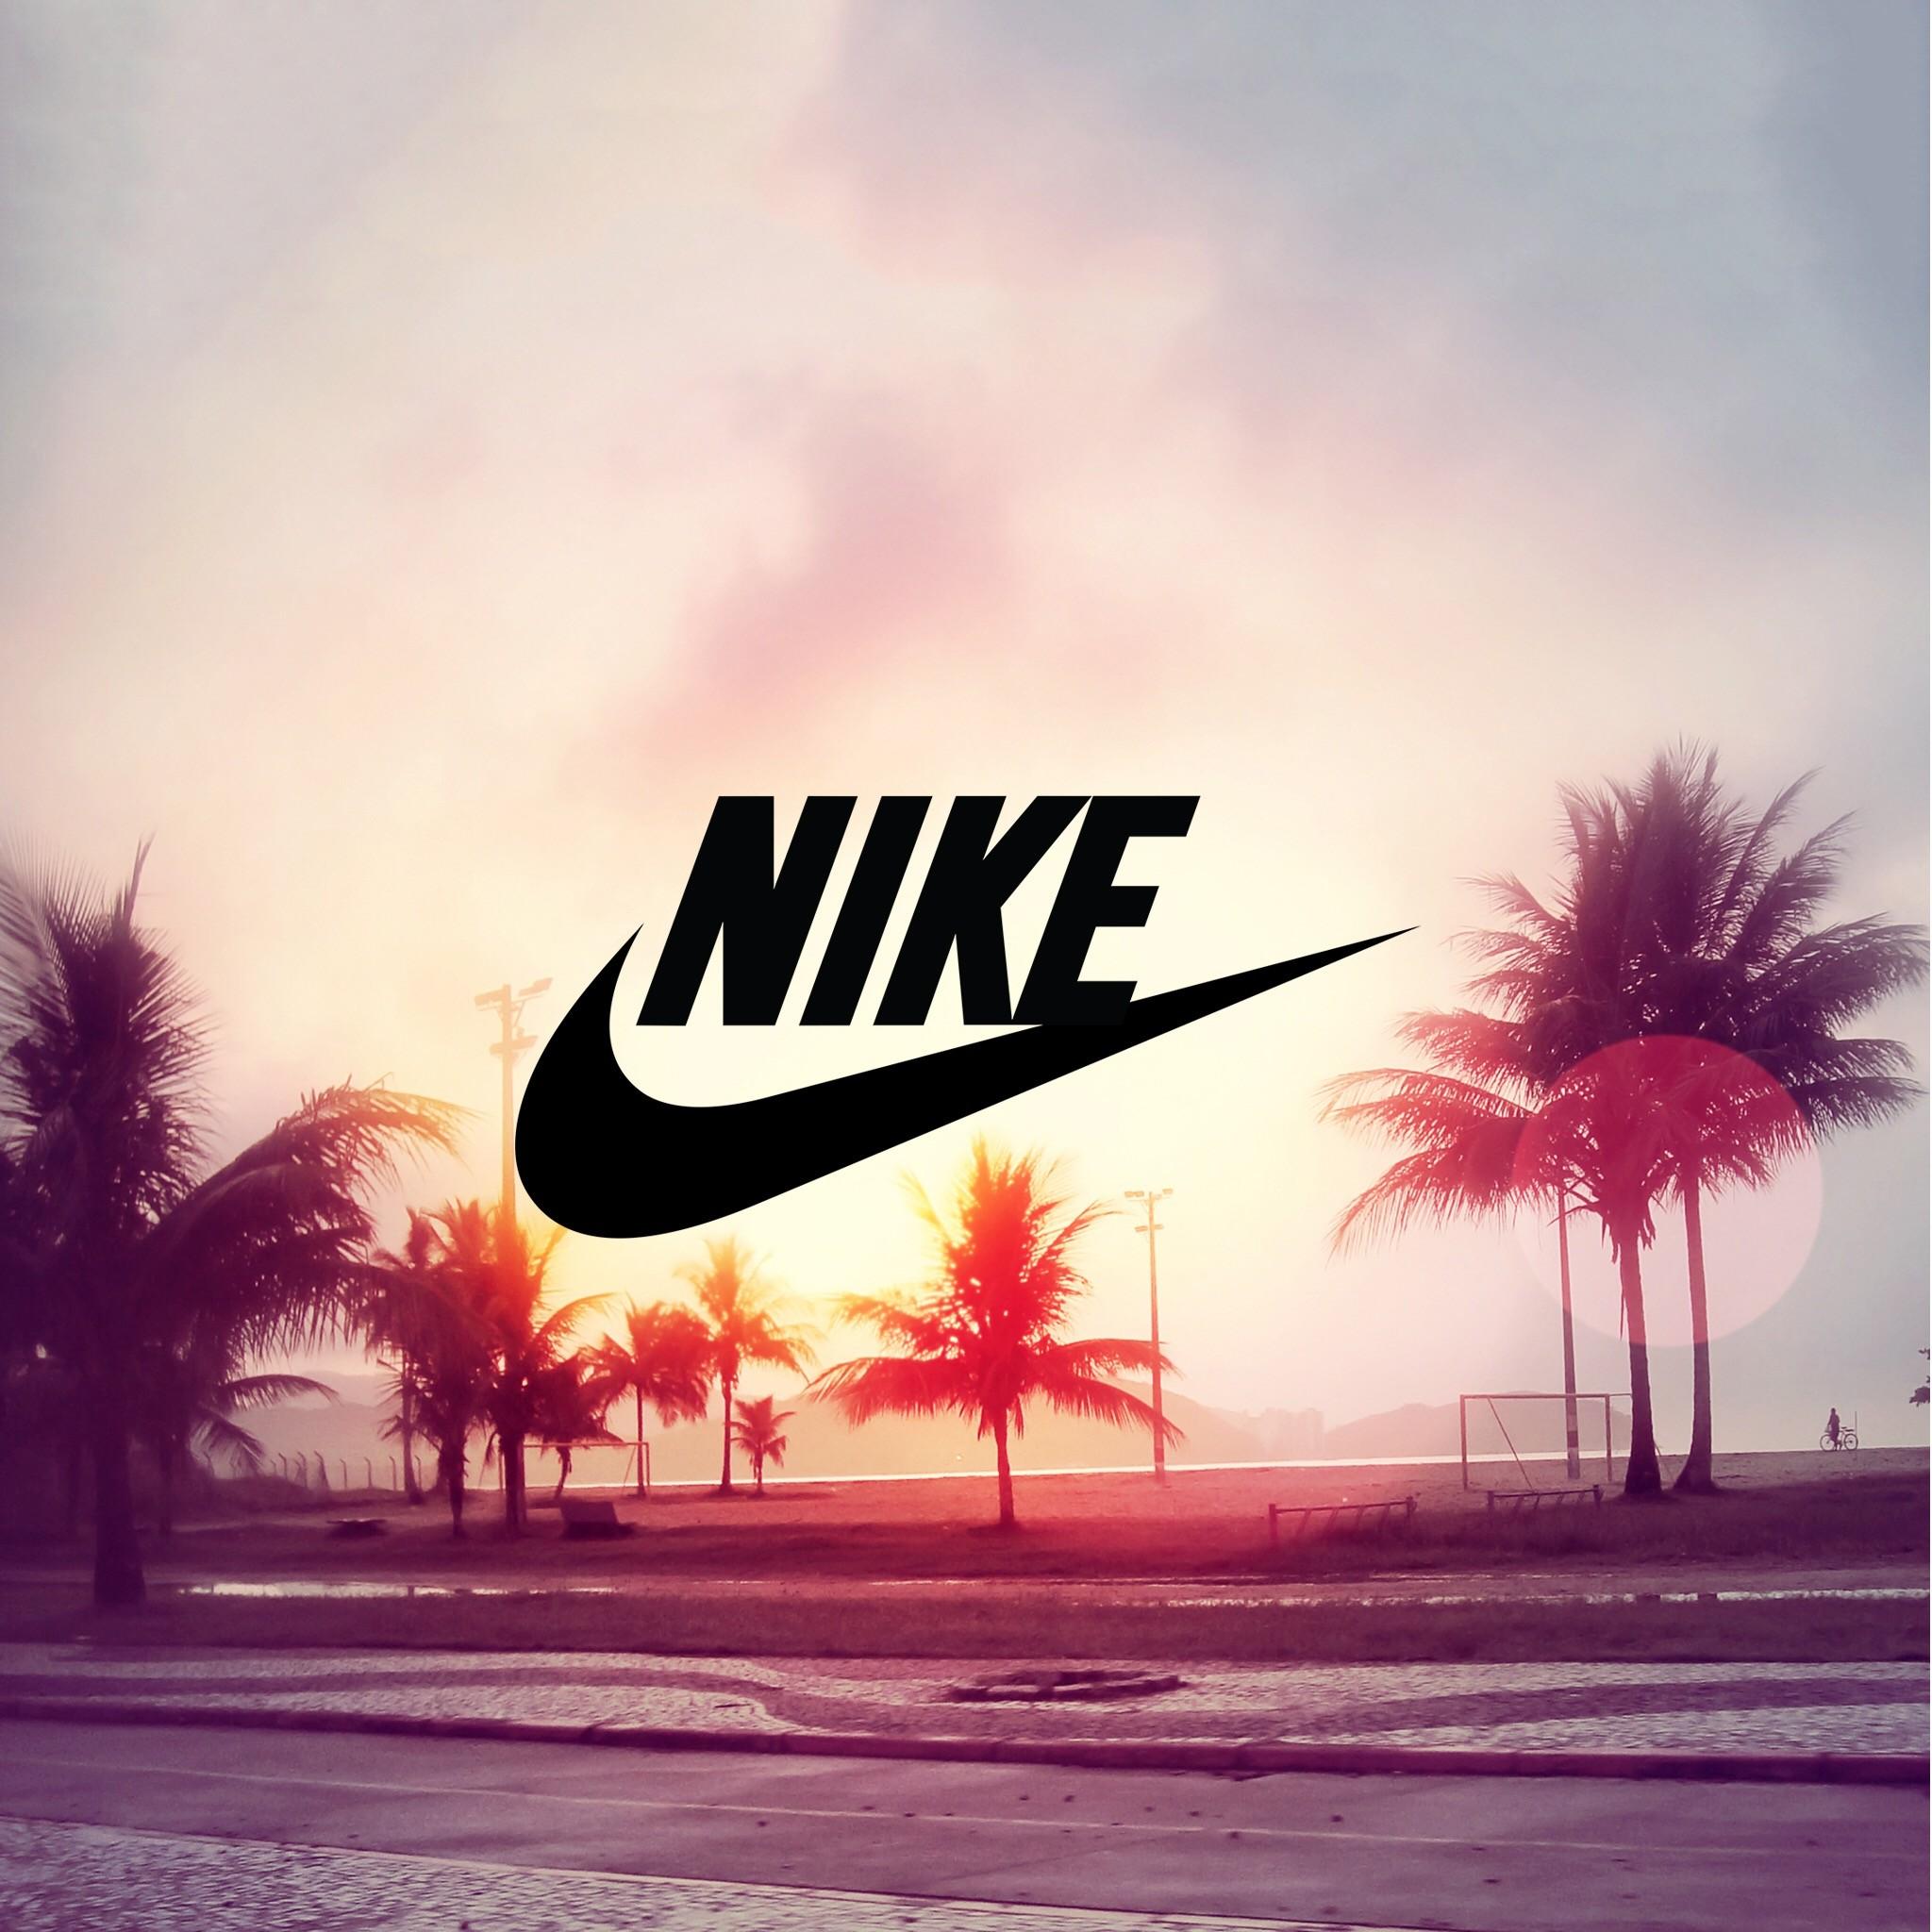 Nike Quotes Wallpaper: Nike Running Wallpaper (62+ Images